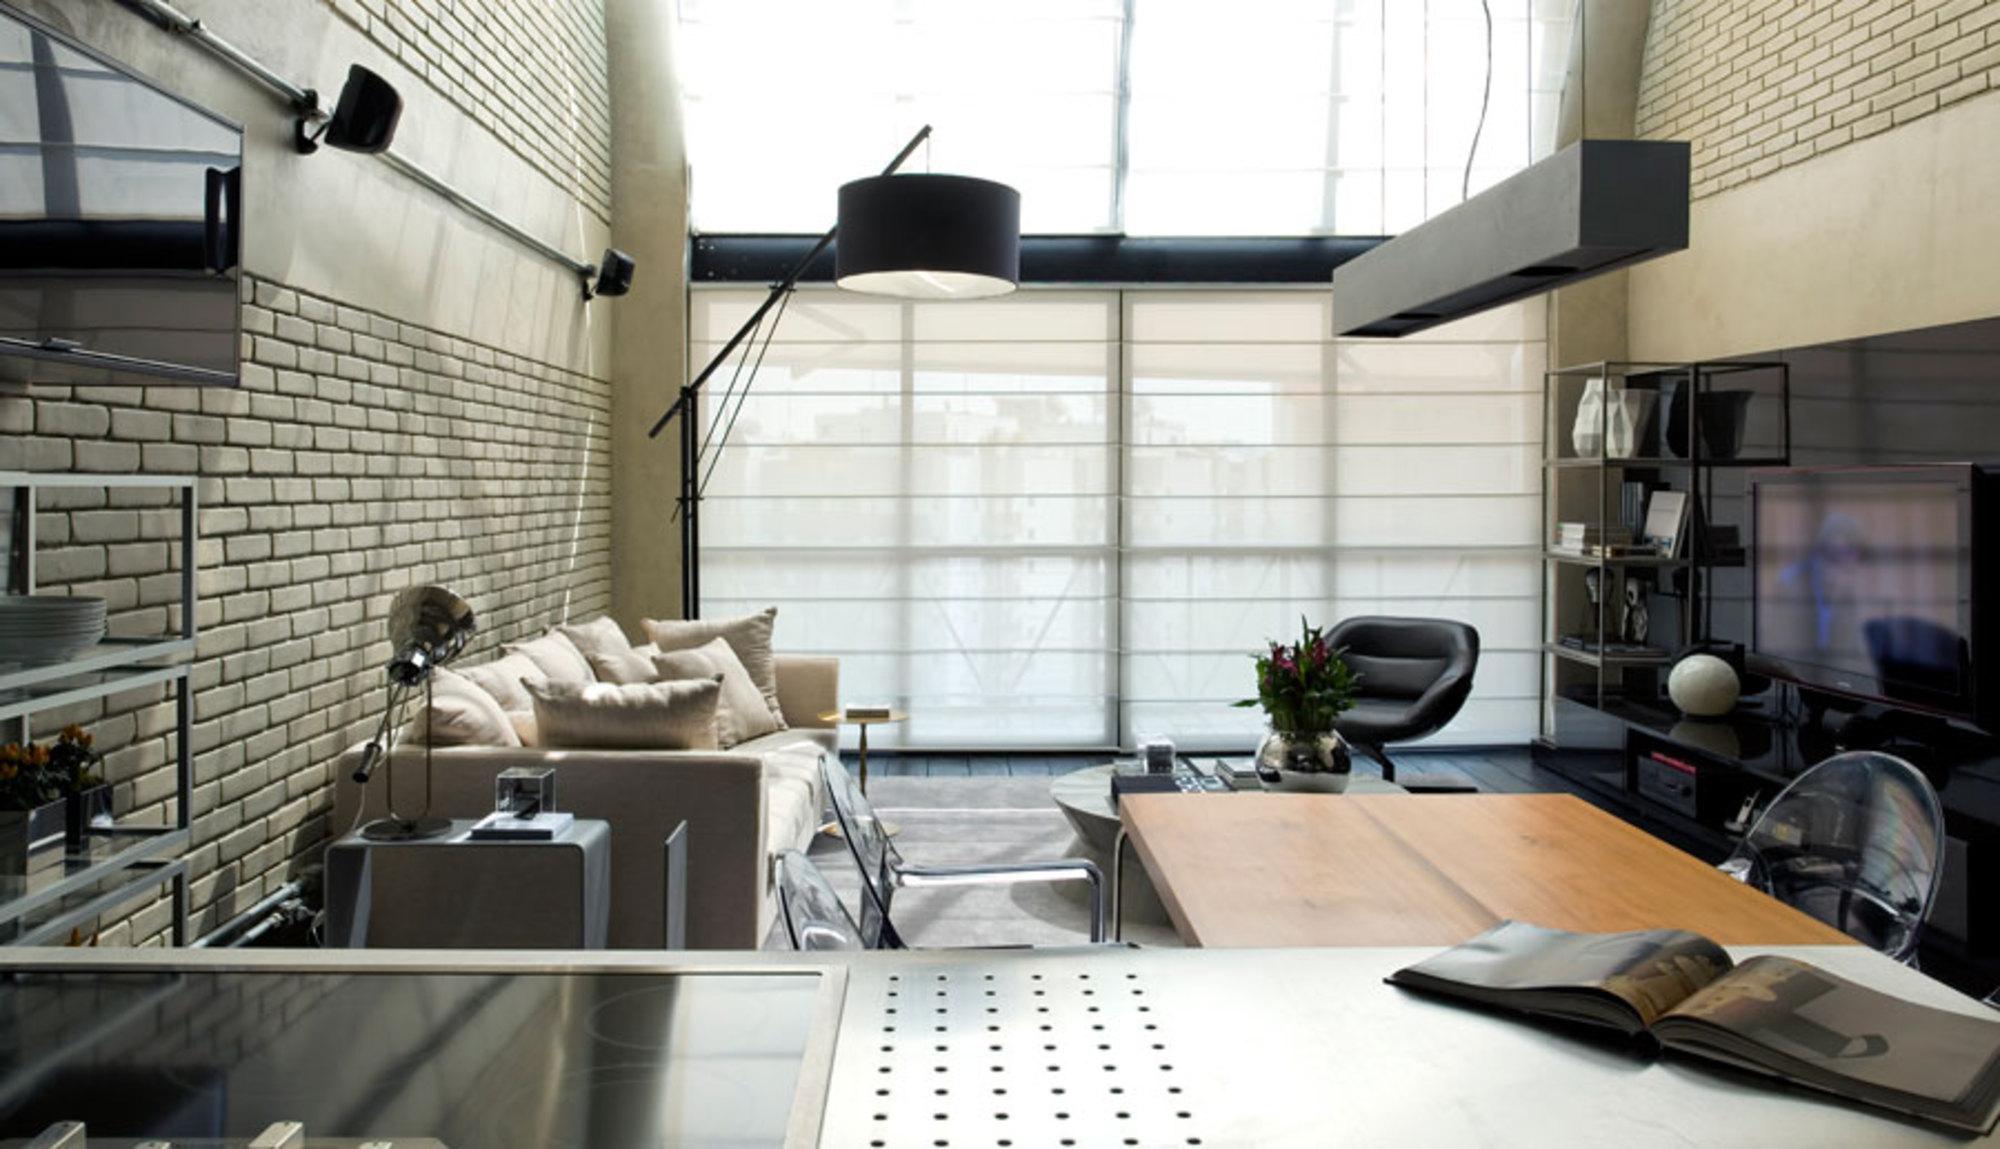 Loft contempor neo e masculino casa de valentina for Interior design moderno e contemporaneo